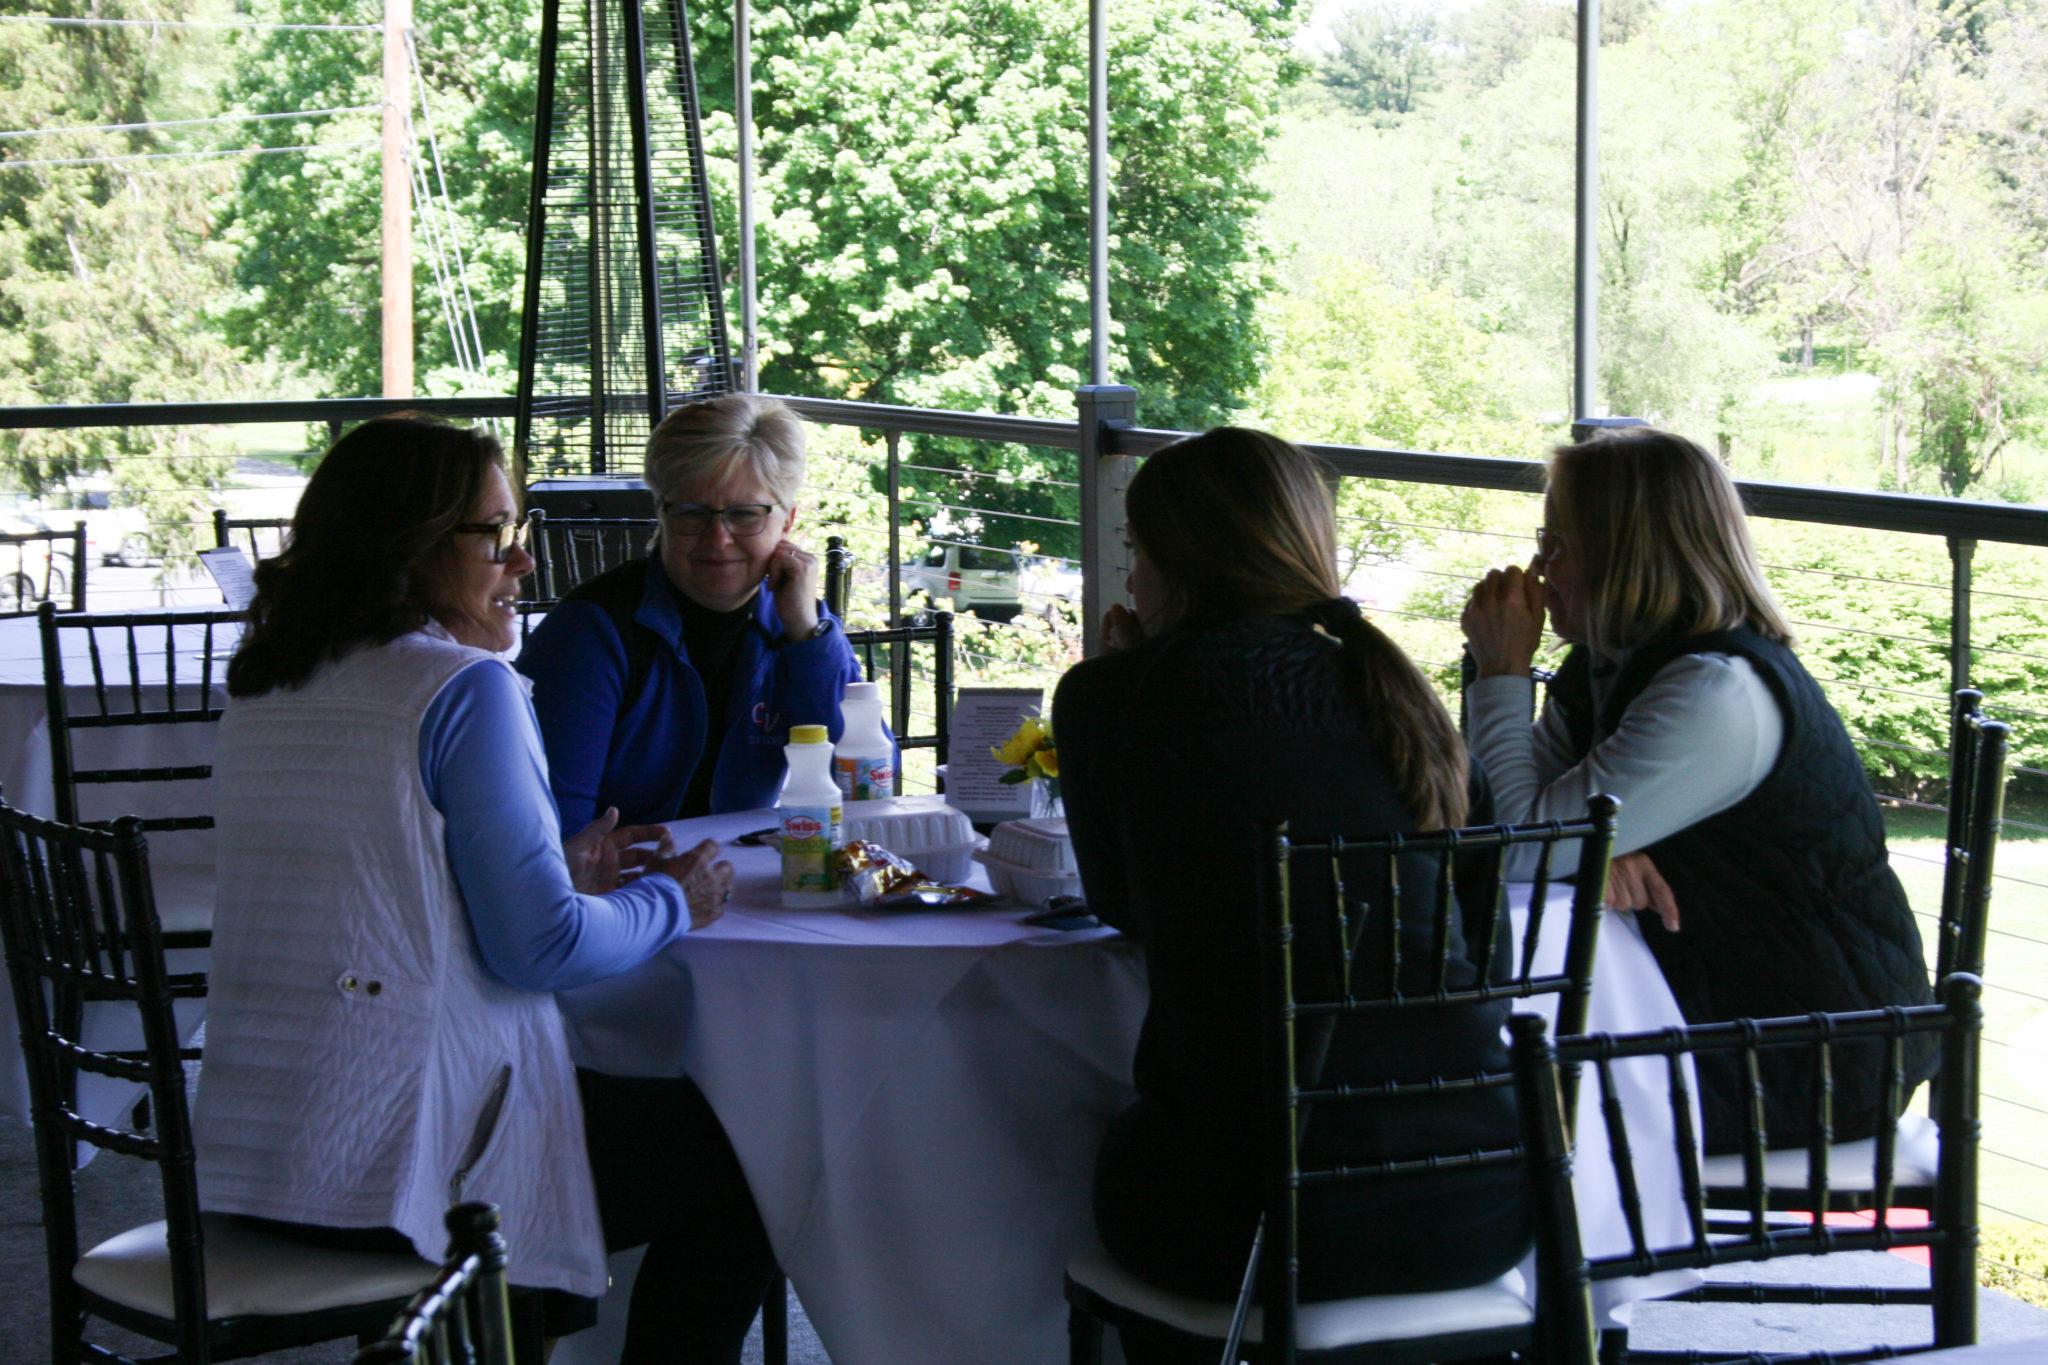 4 women talking around table